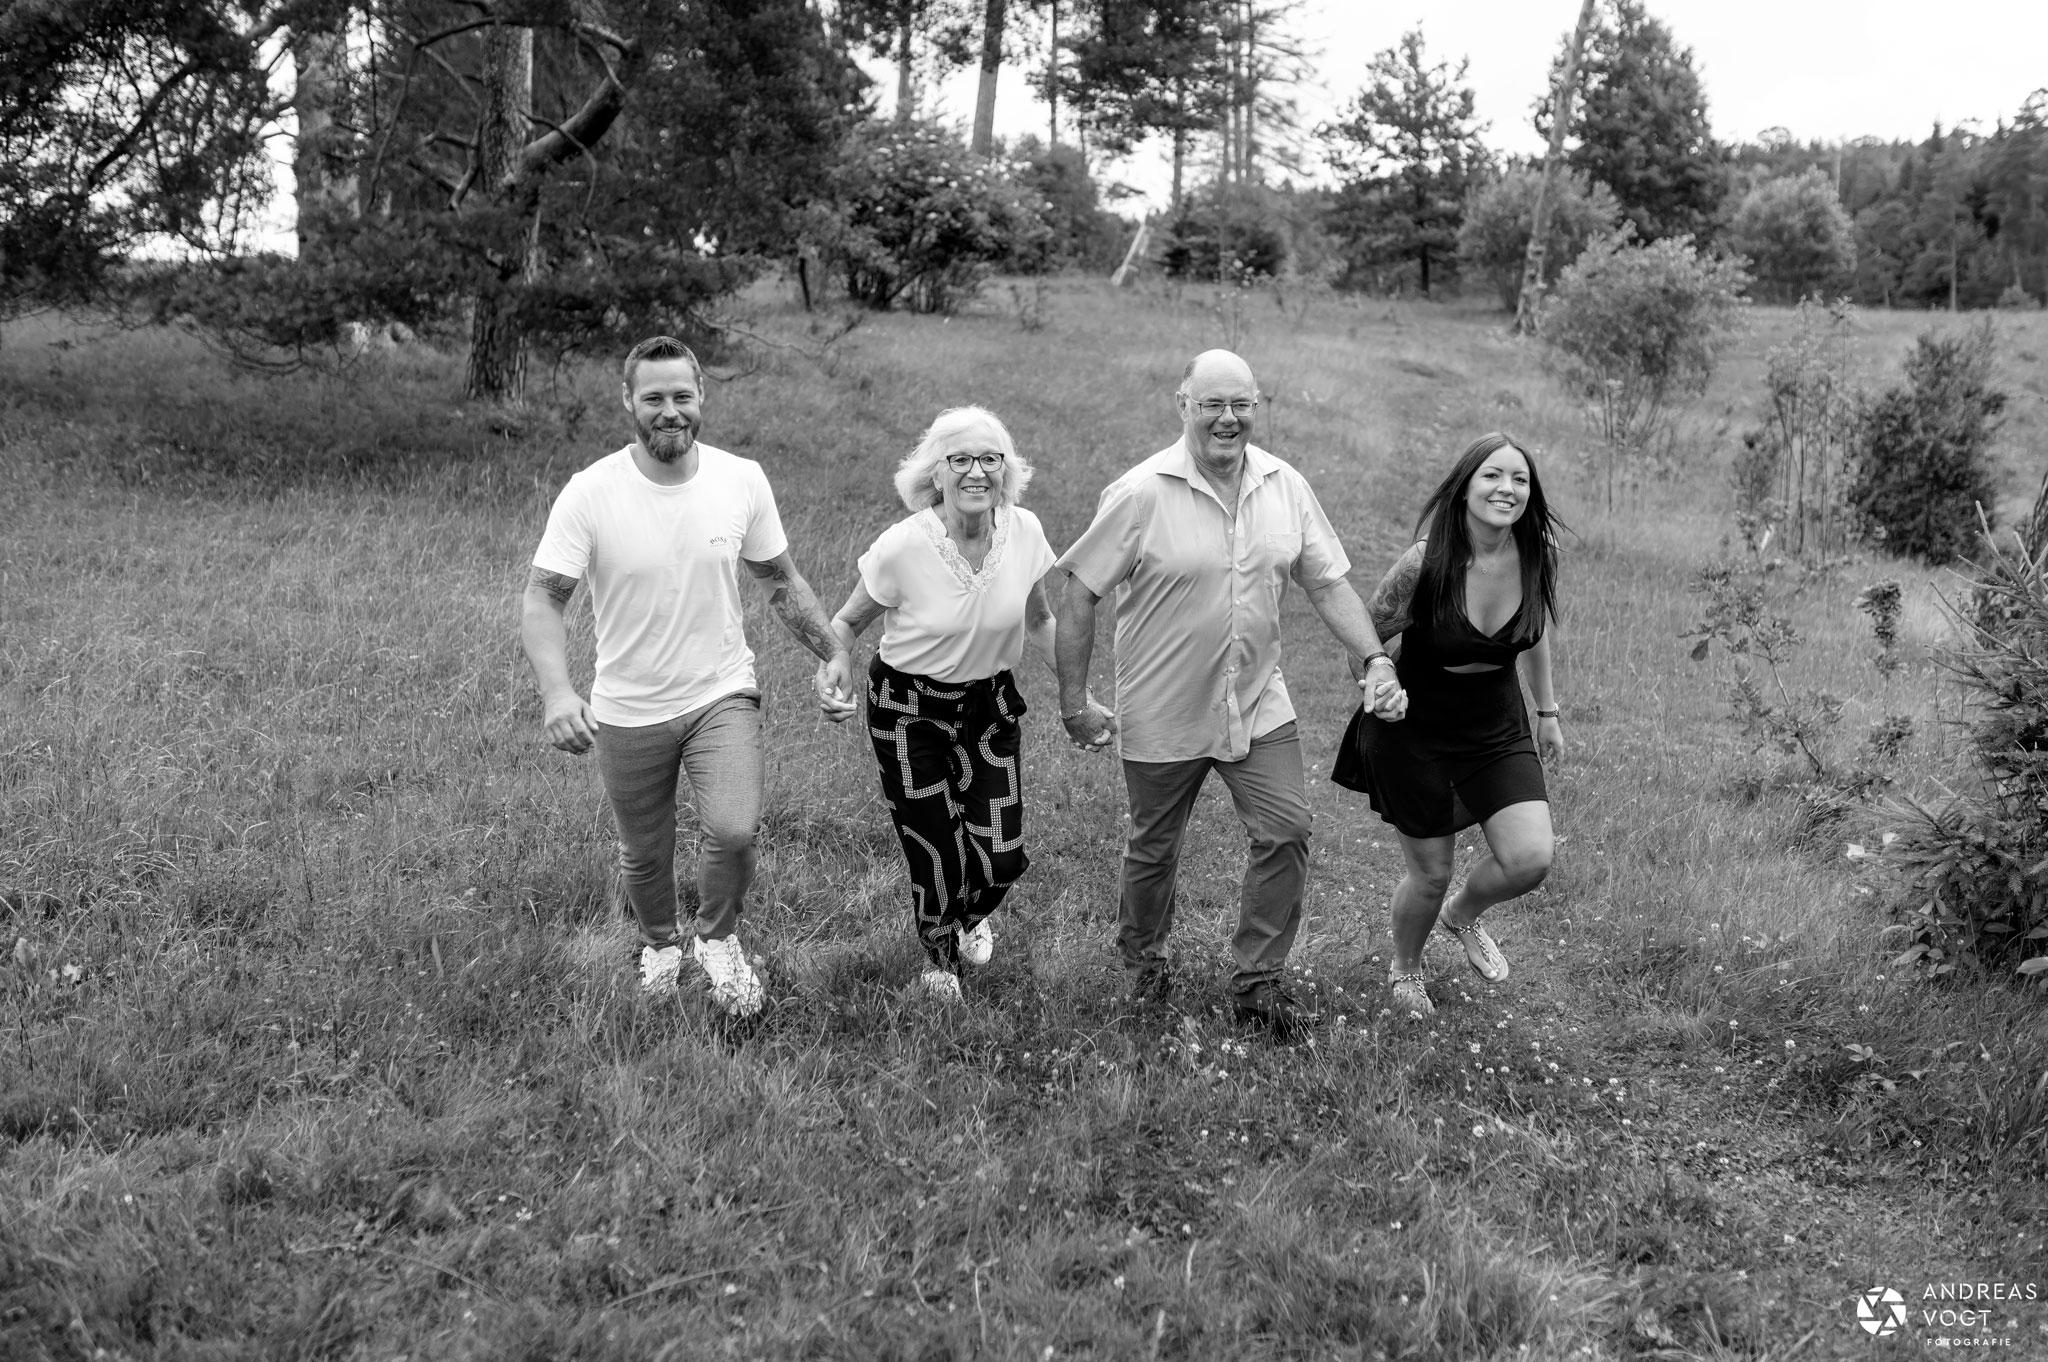 Familienfotos im Wental 08 - Fotograf Andreas Vogt aus Aalen